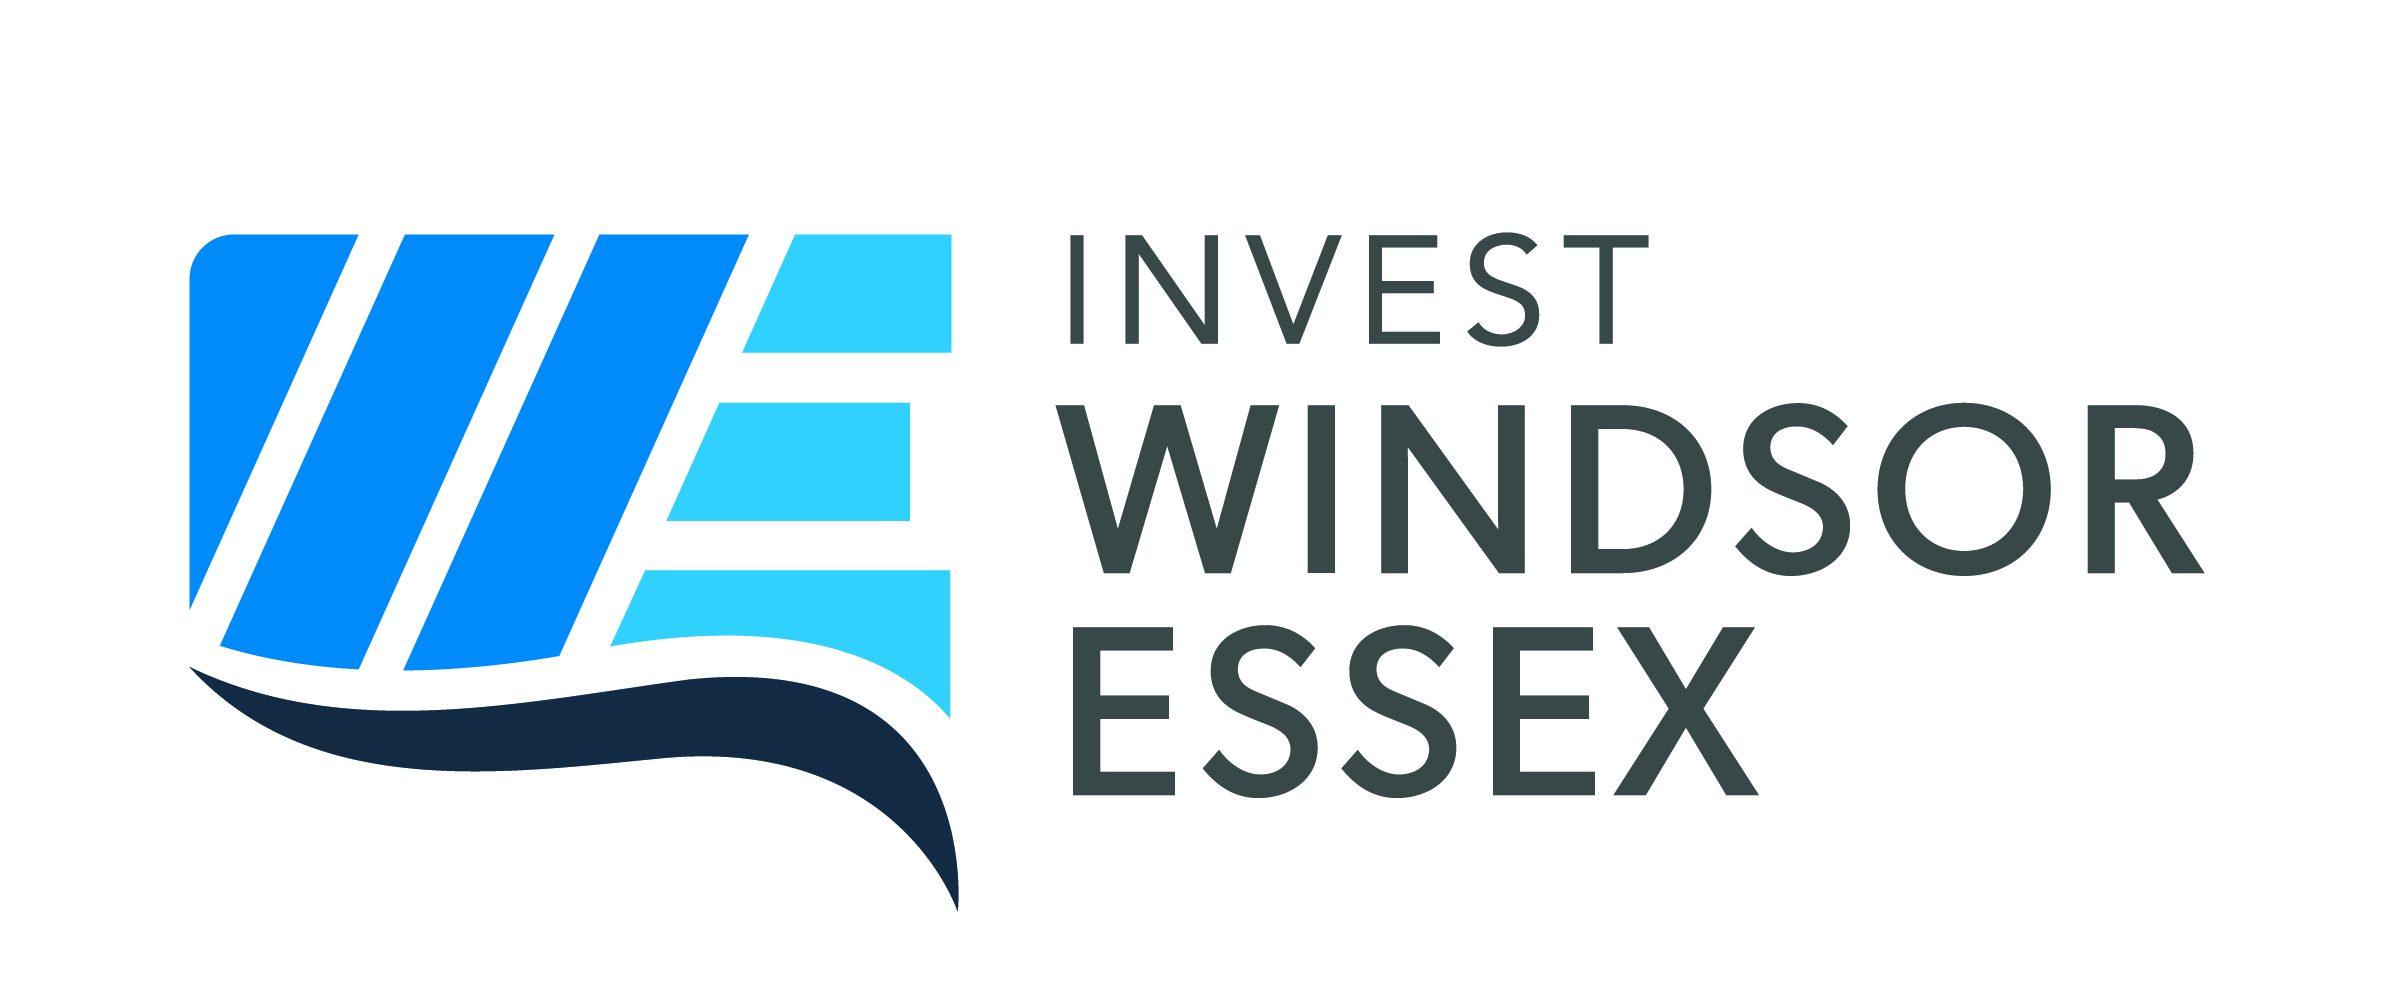 Invest WindsorEssex